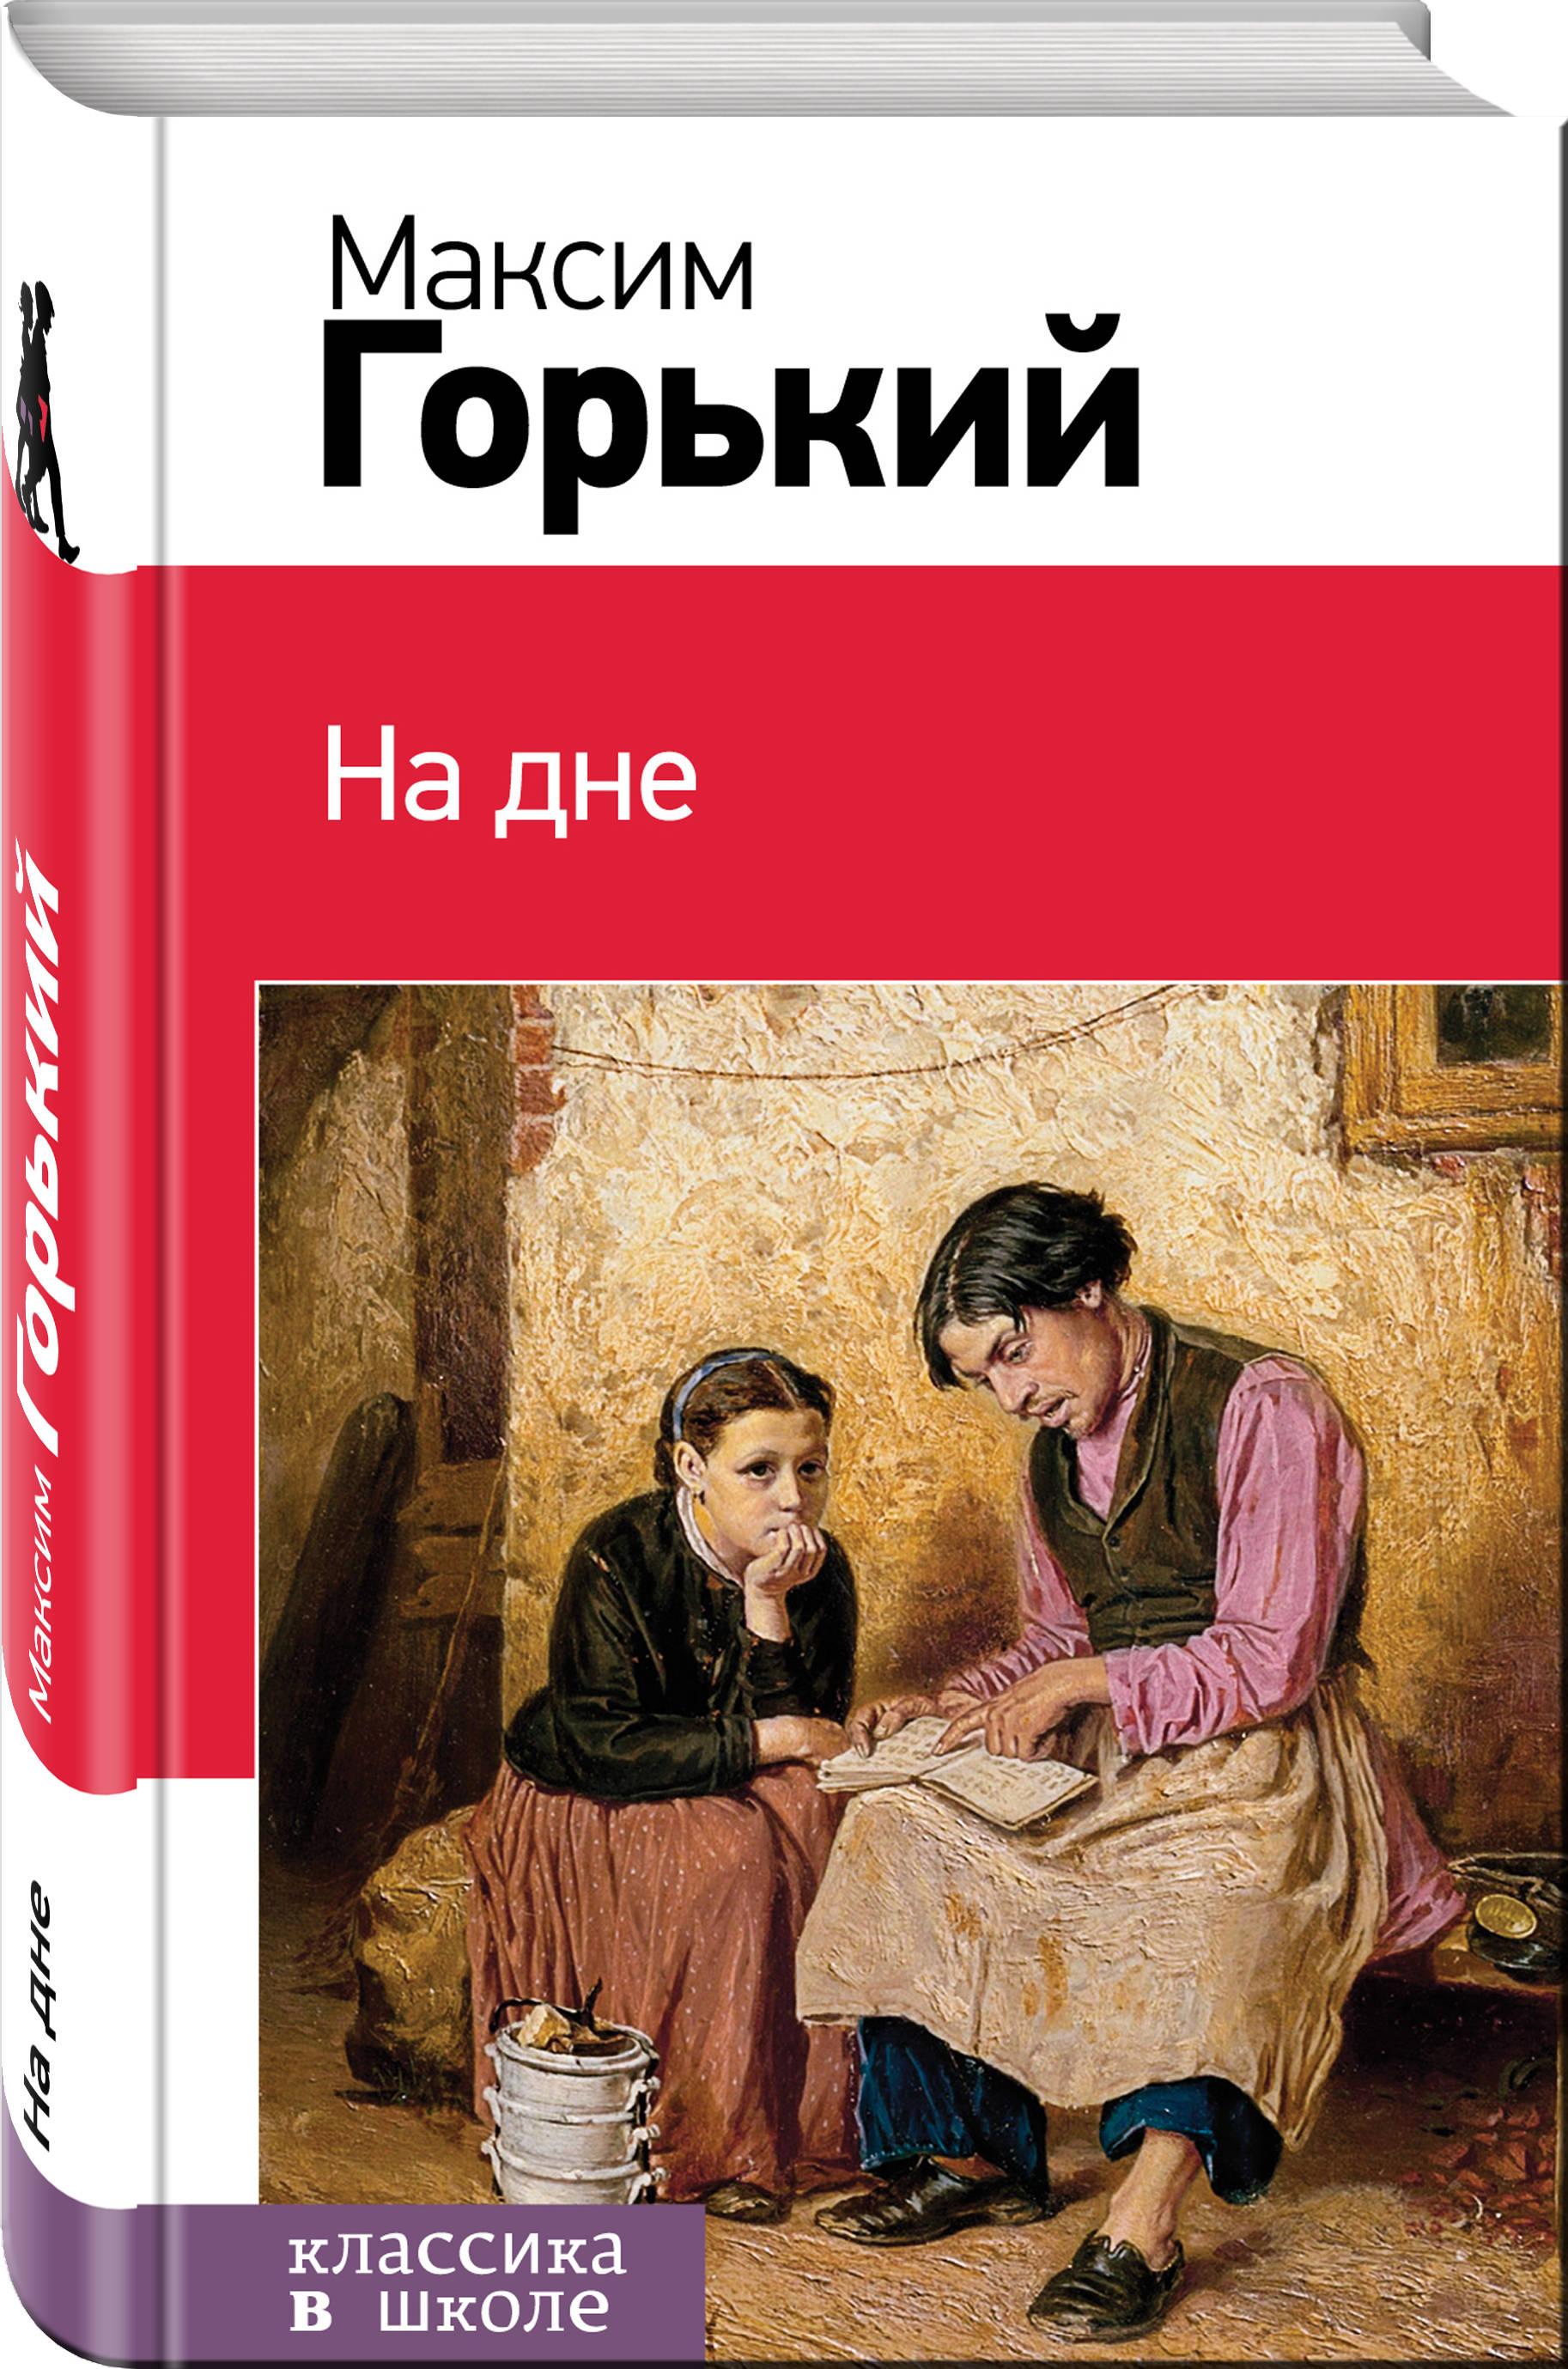 Горький М. На дне ISBN: 978-5-04-092620-6 олег лекманов максим горький пьеса на дне